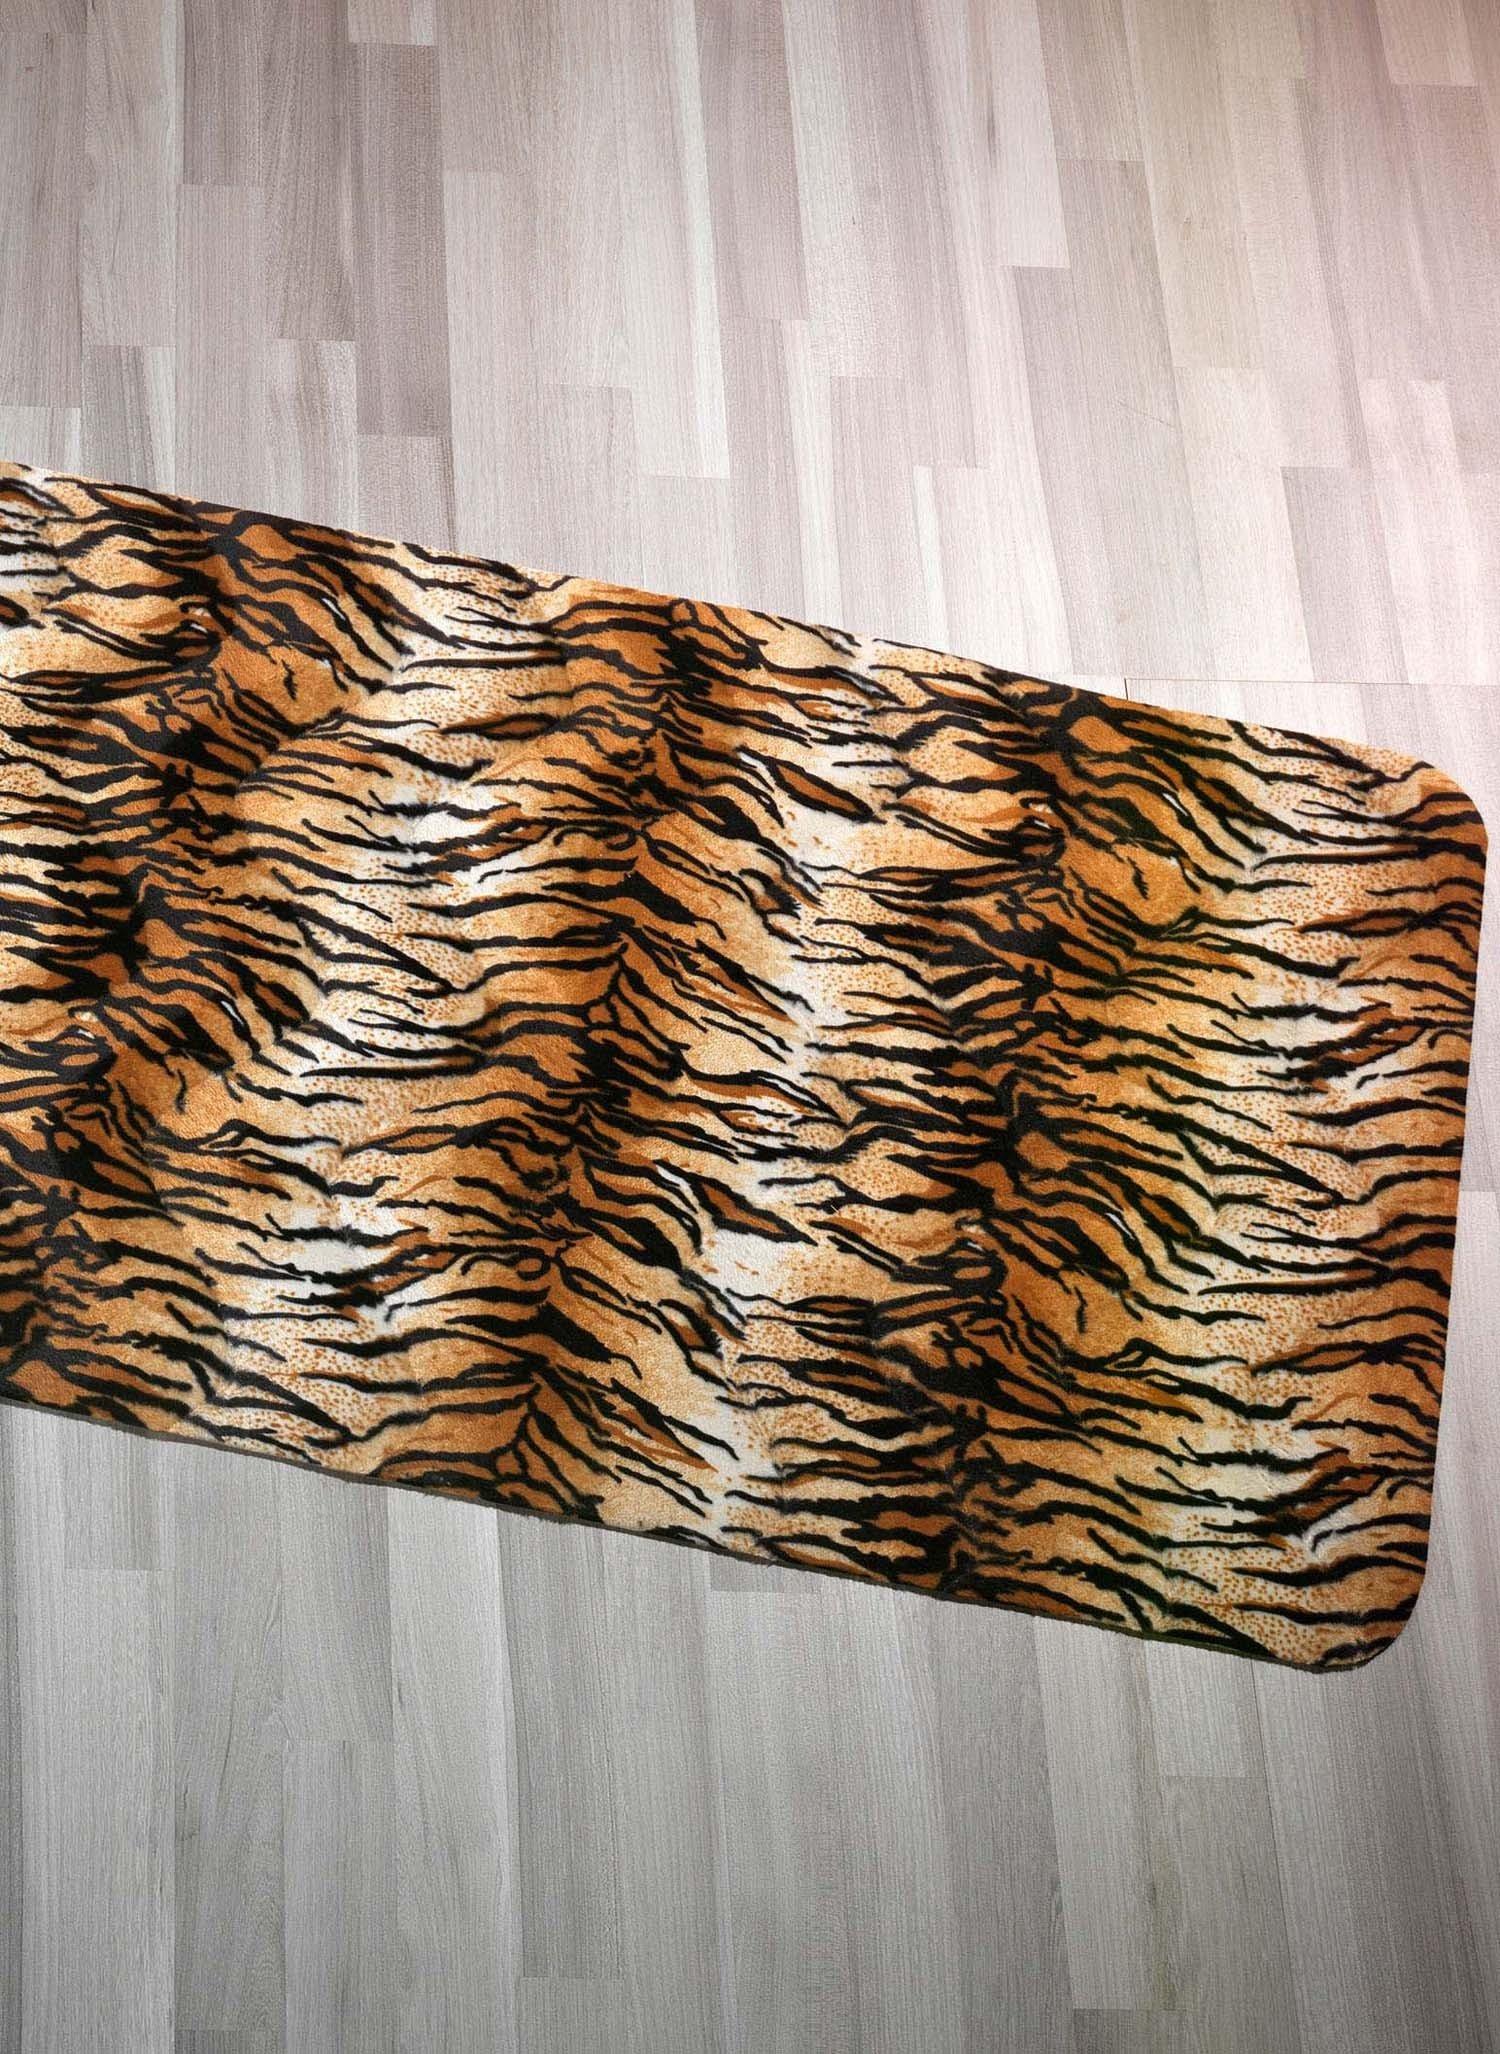 "Teppich""TIGER"" 55x95cm"